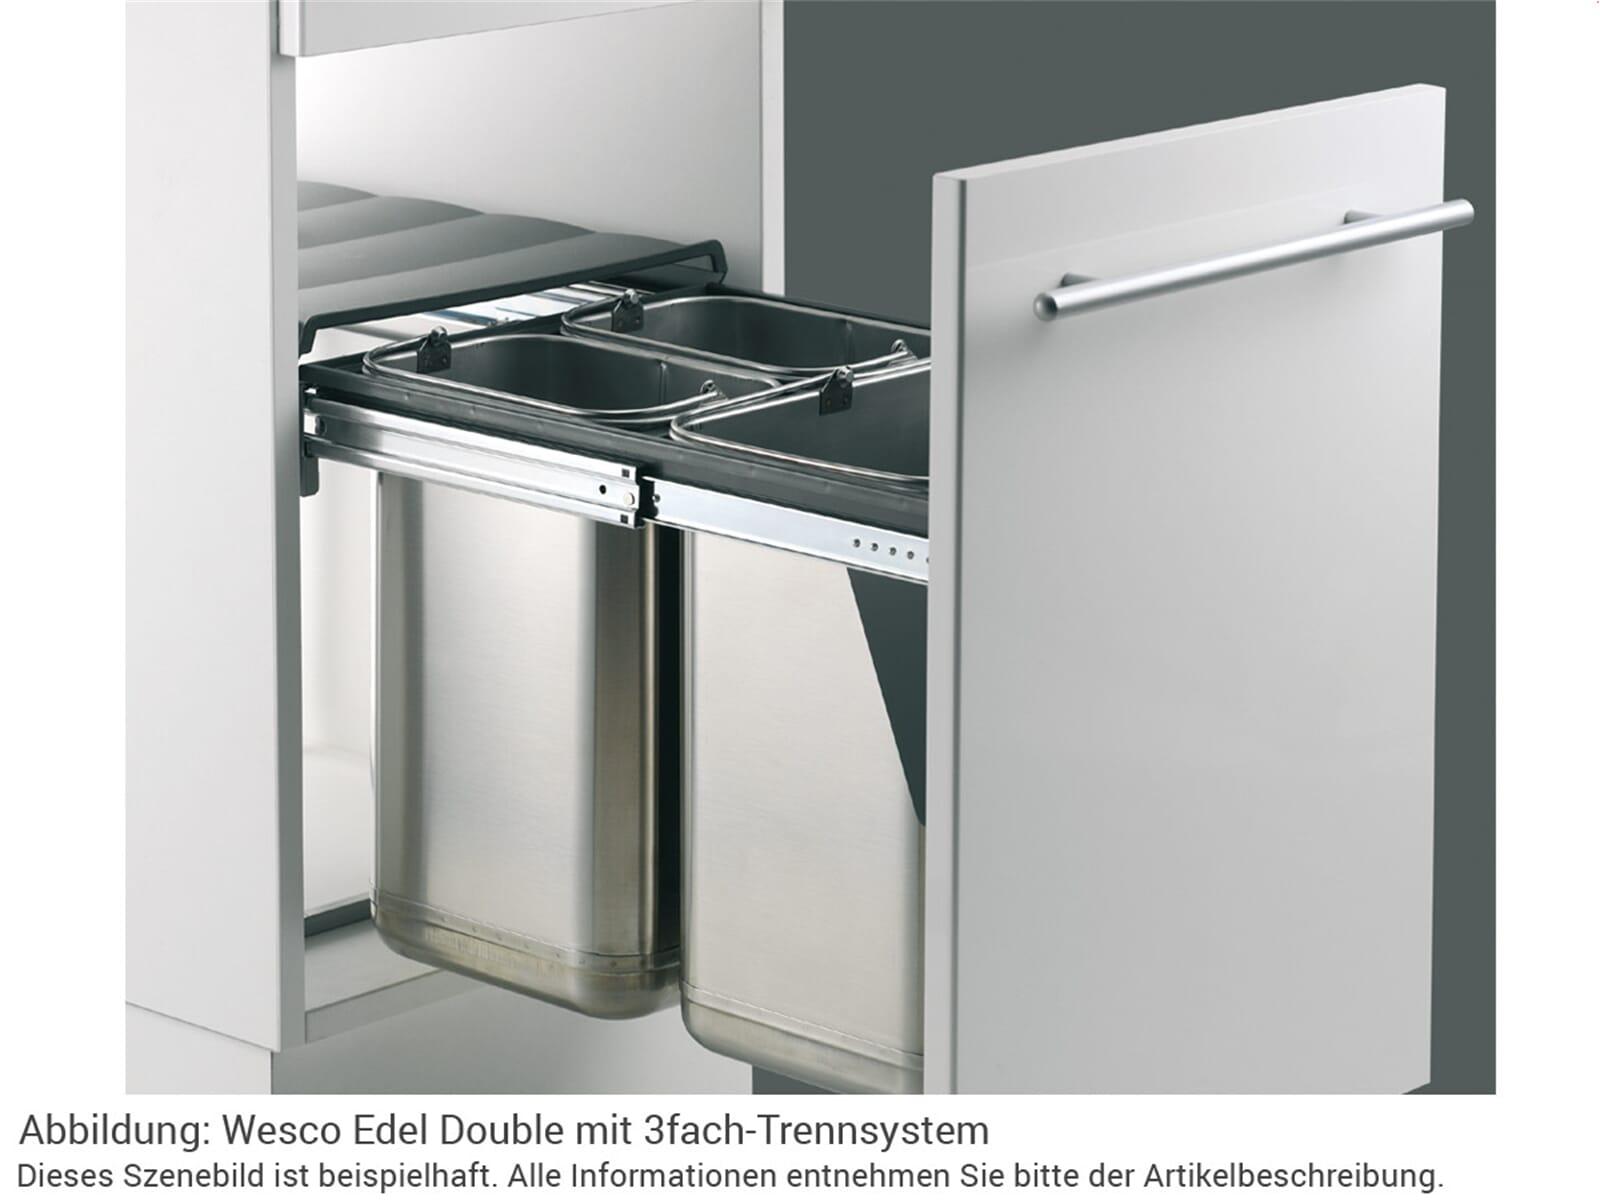 wesco edel double 785304 42 einbau abfallsammler edelstahl. Black Bedroom Furniture Sets. Home Design Ideas